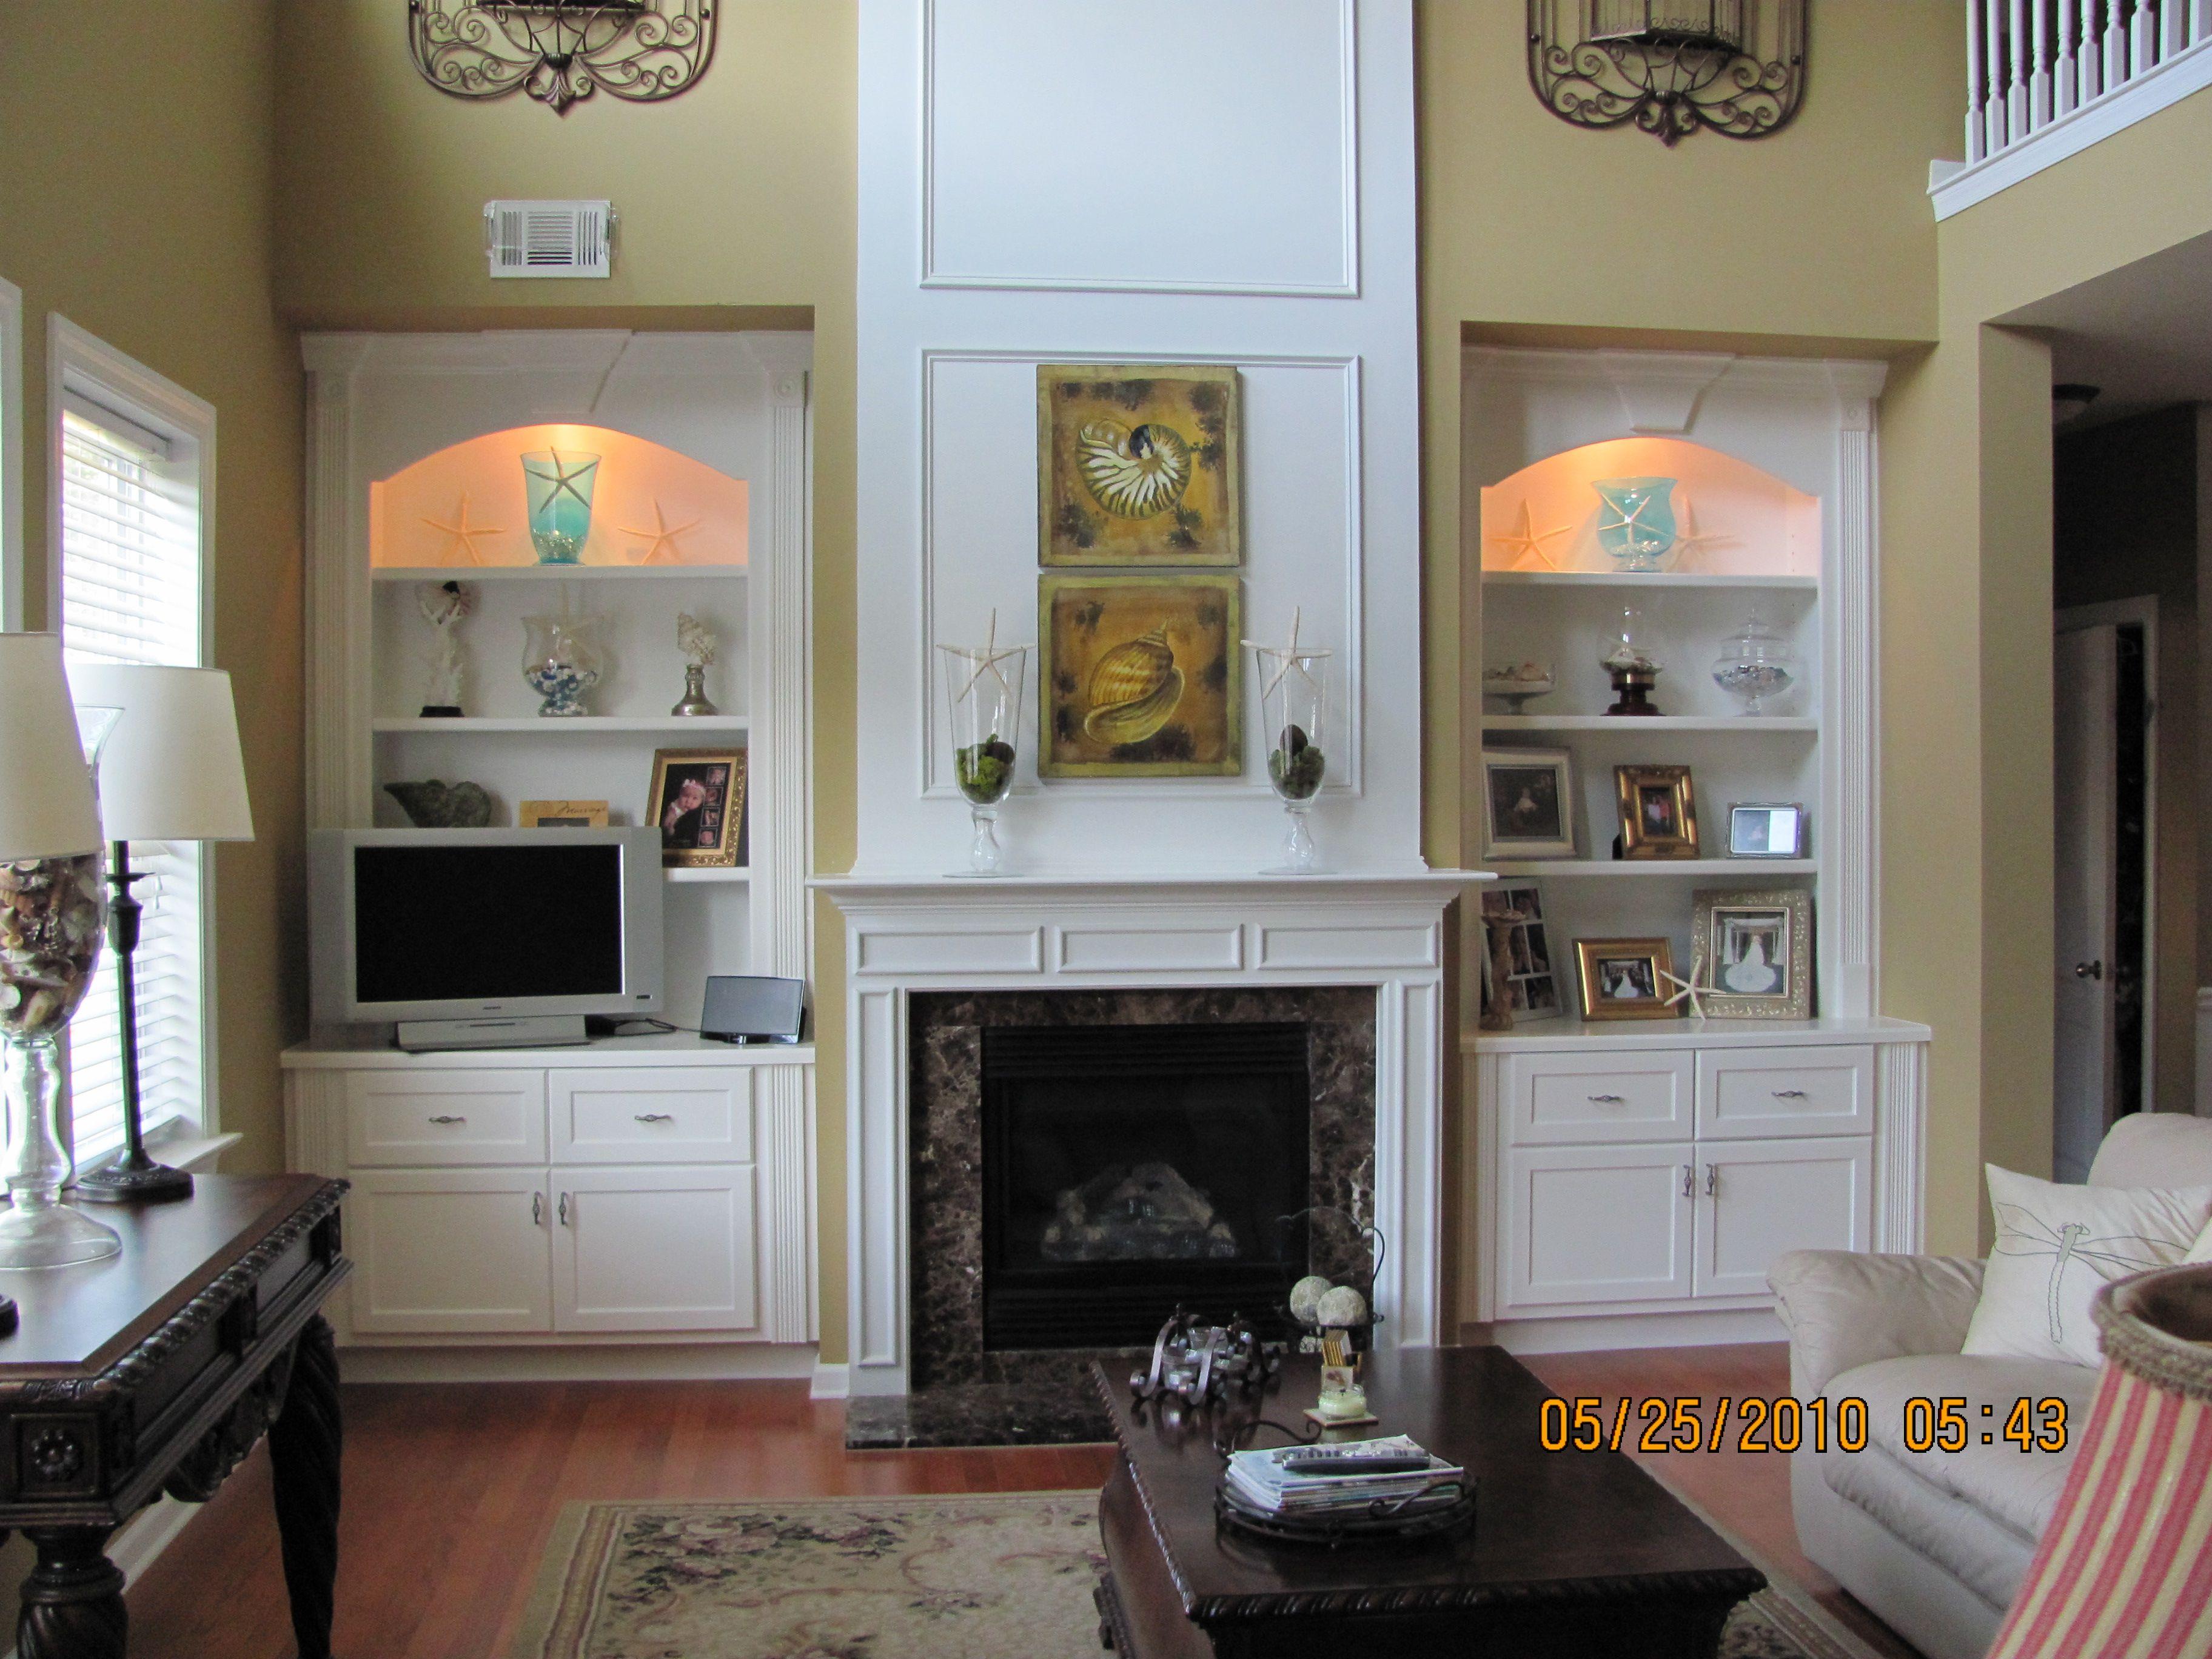 43 Very Inspiring And Creative Bookshelf Decorating Ideas Fireplace Bookshelves Country Fireplace Fireplace Built Ins